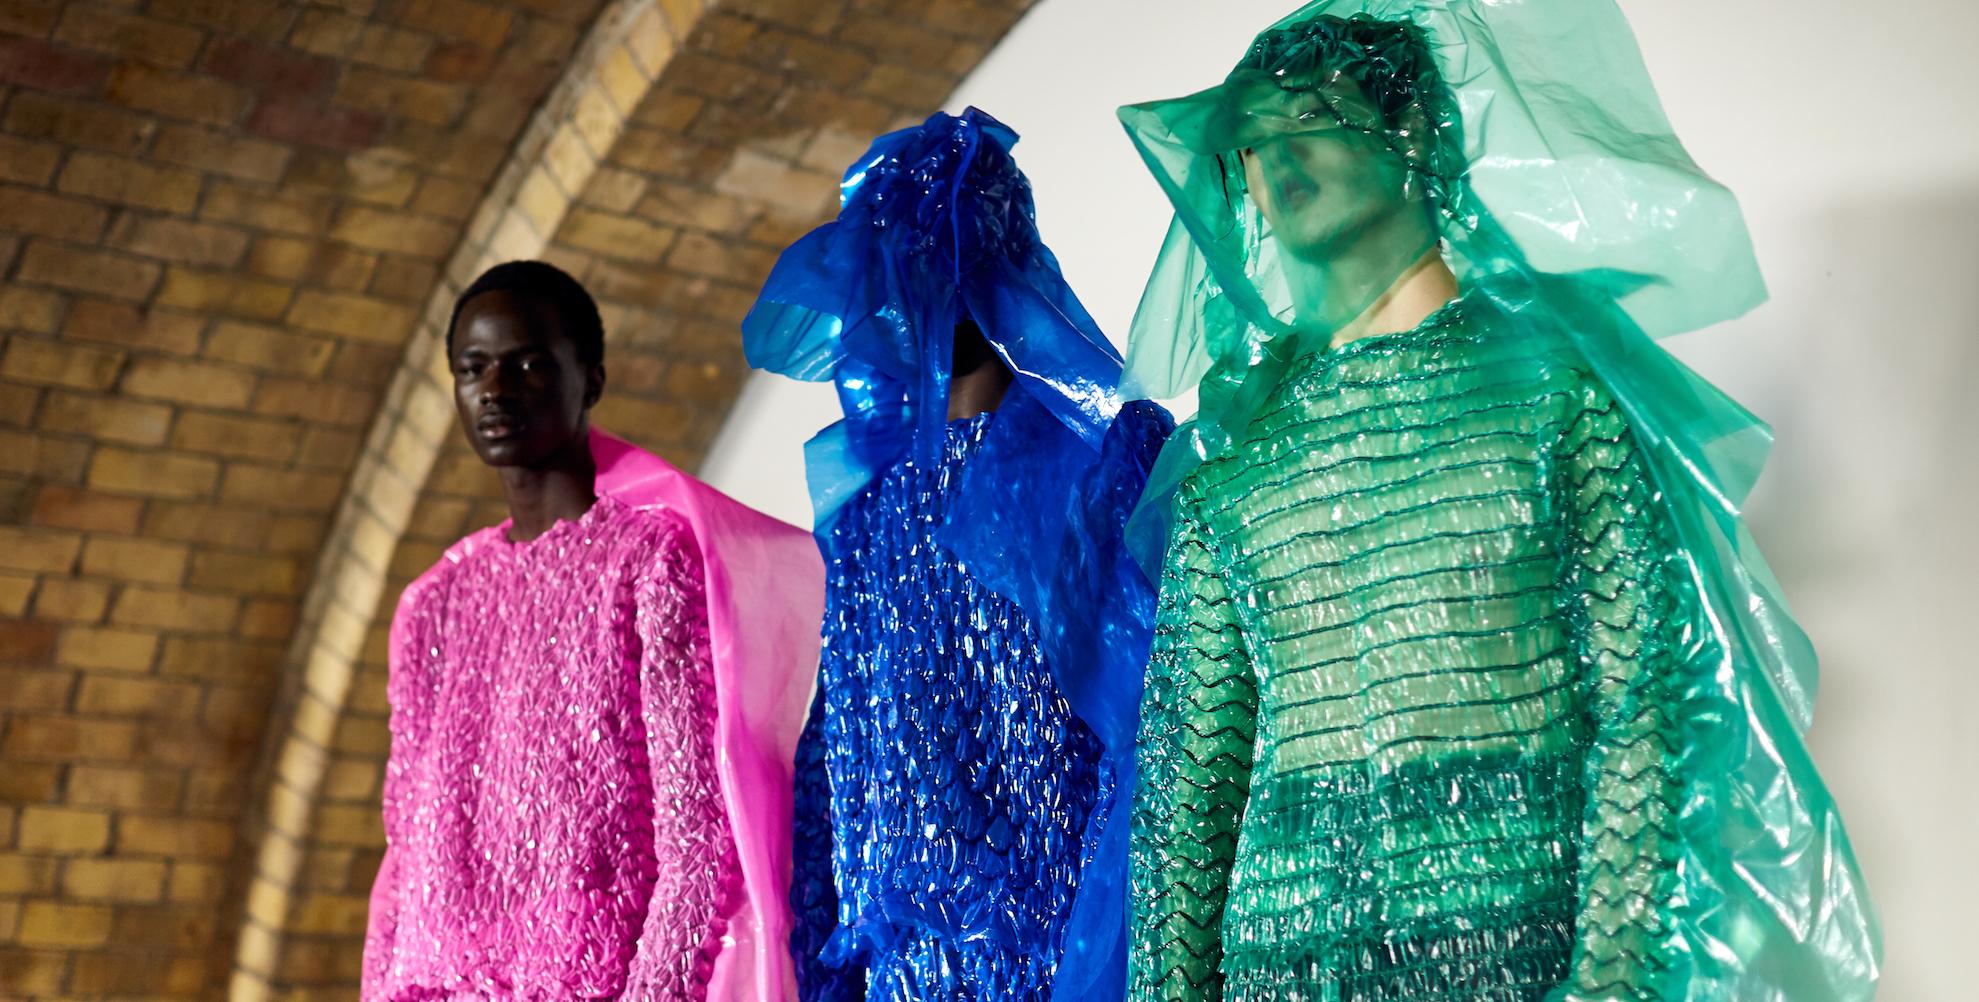 Craig Green AW19 på London Fashion Week Men's